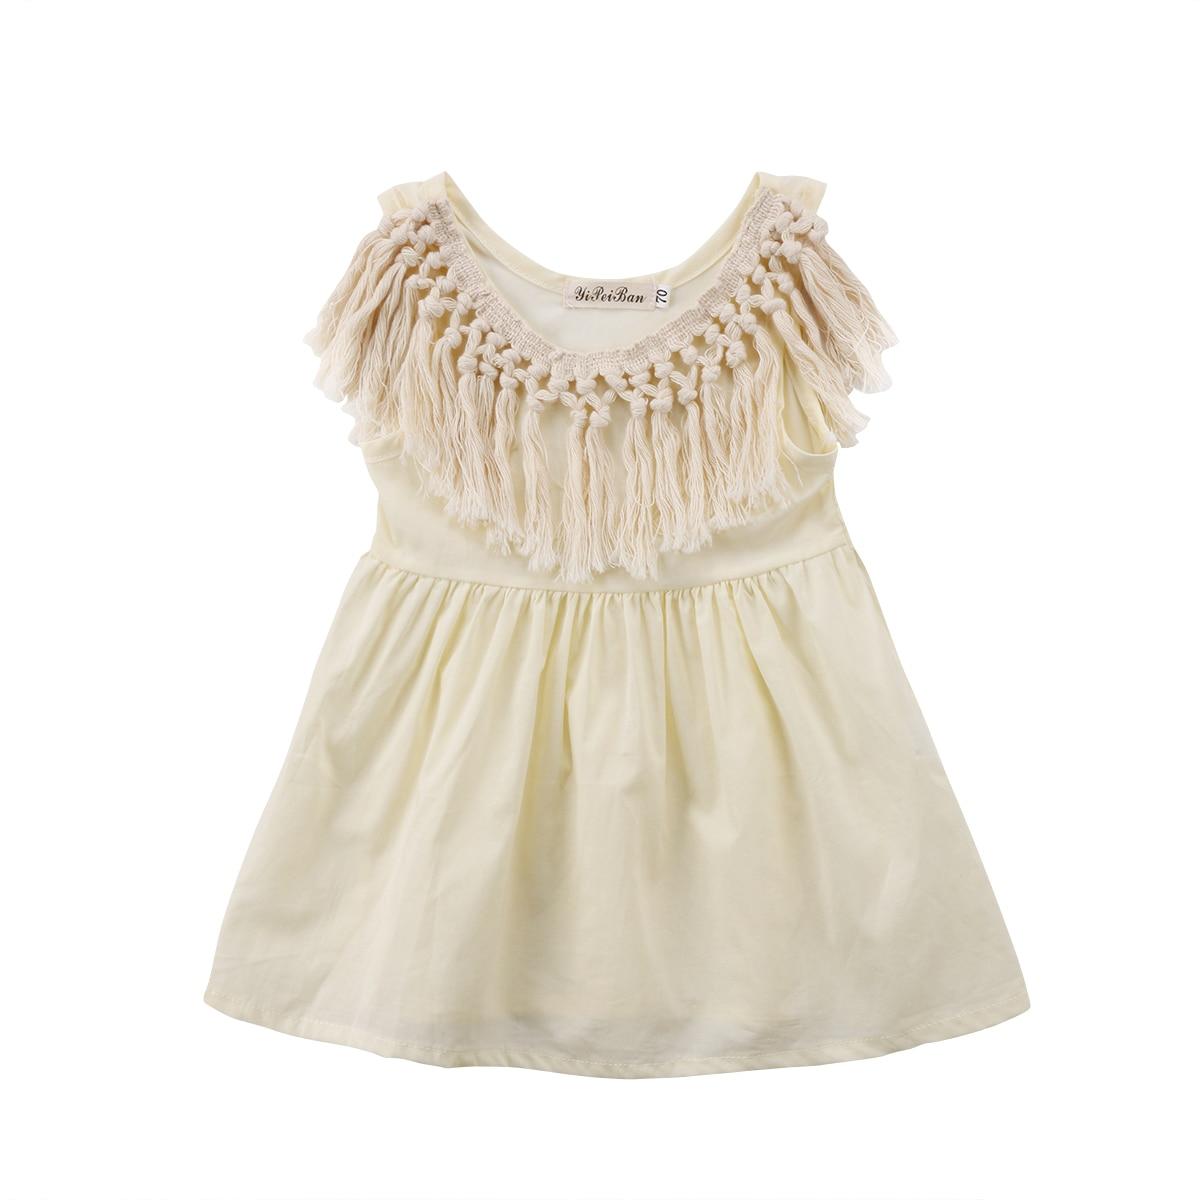 2018 Cute Fashion Newborn Toddler Kids Baby Girl Tassel Collar Summer Dress Sundress 0-24M